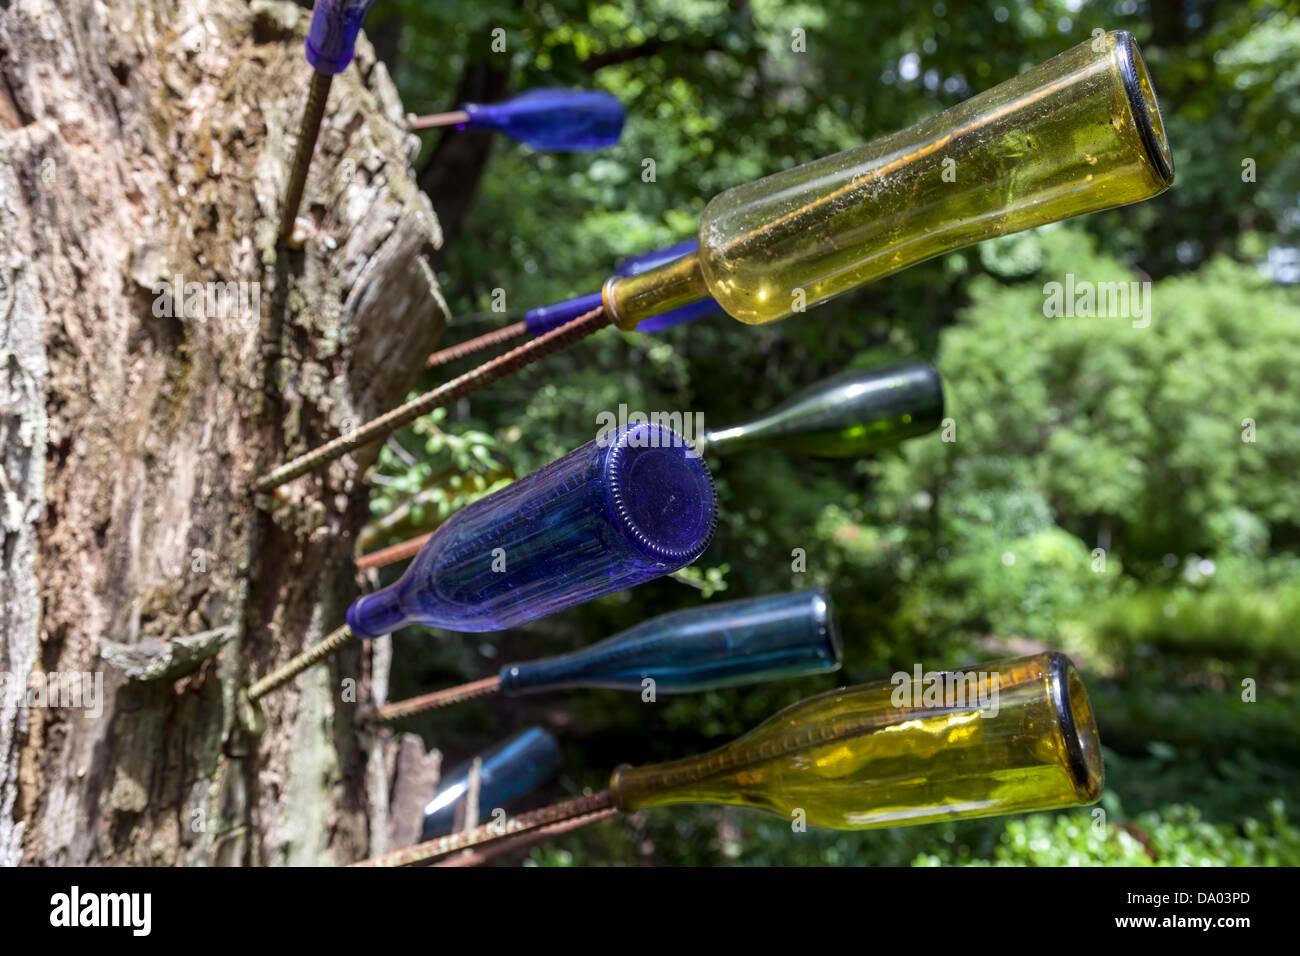 Spirit Bottles Stock Photos & Spirit Bottles Stock Images - Alamy